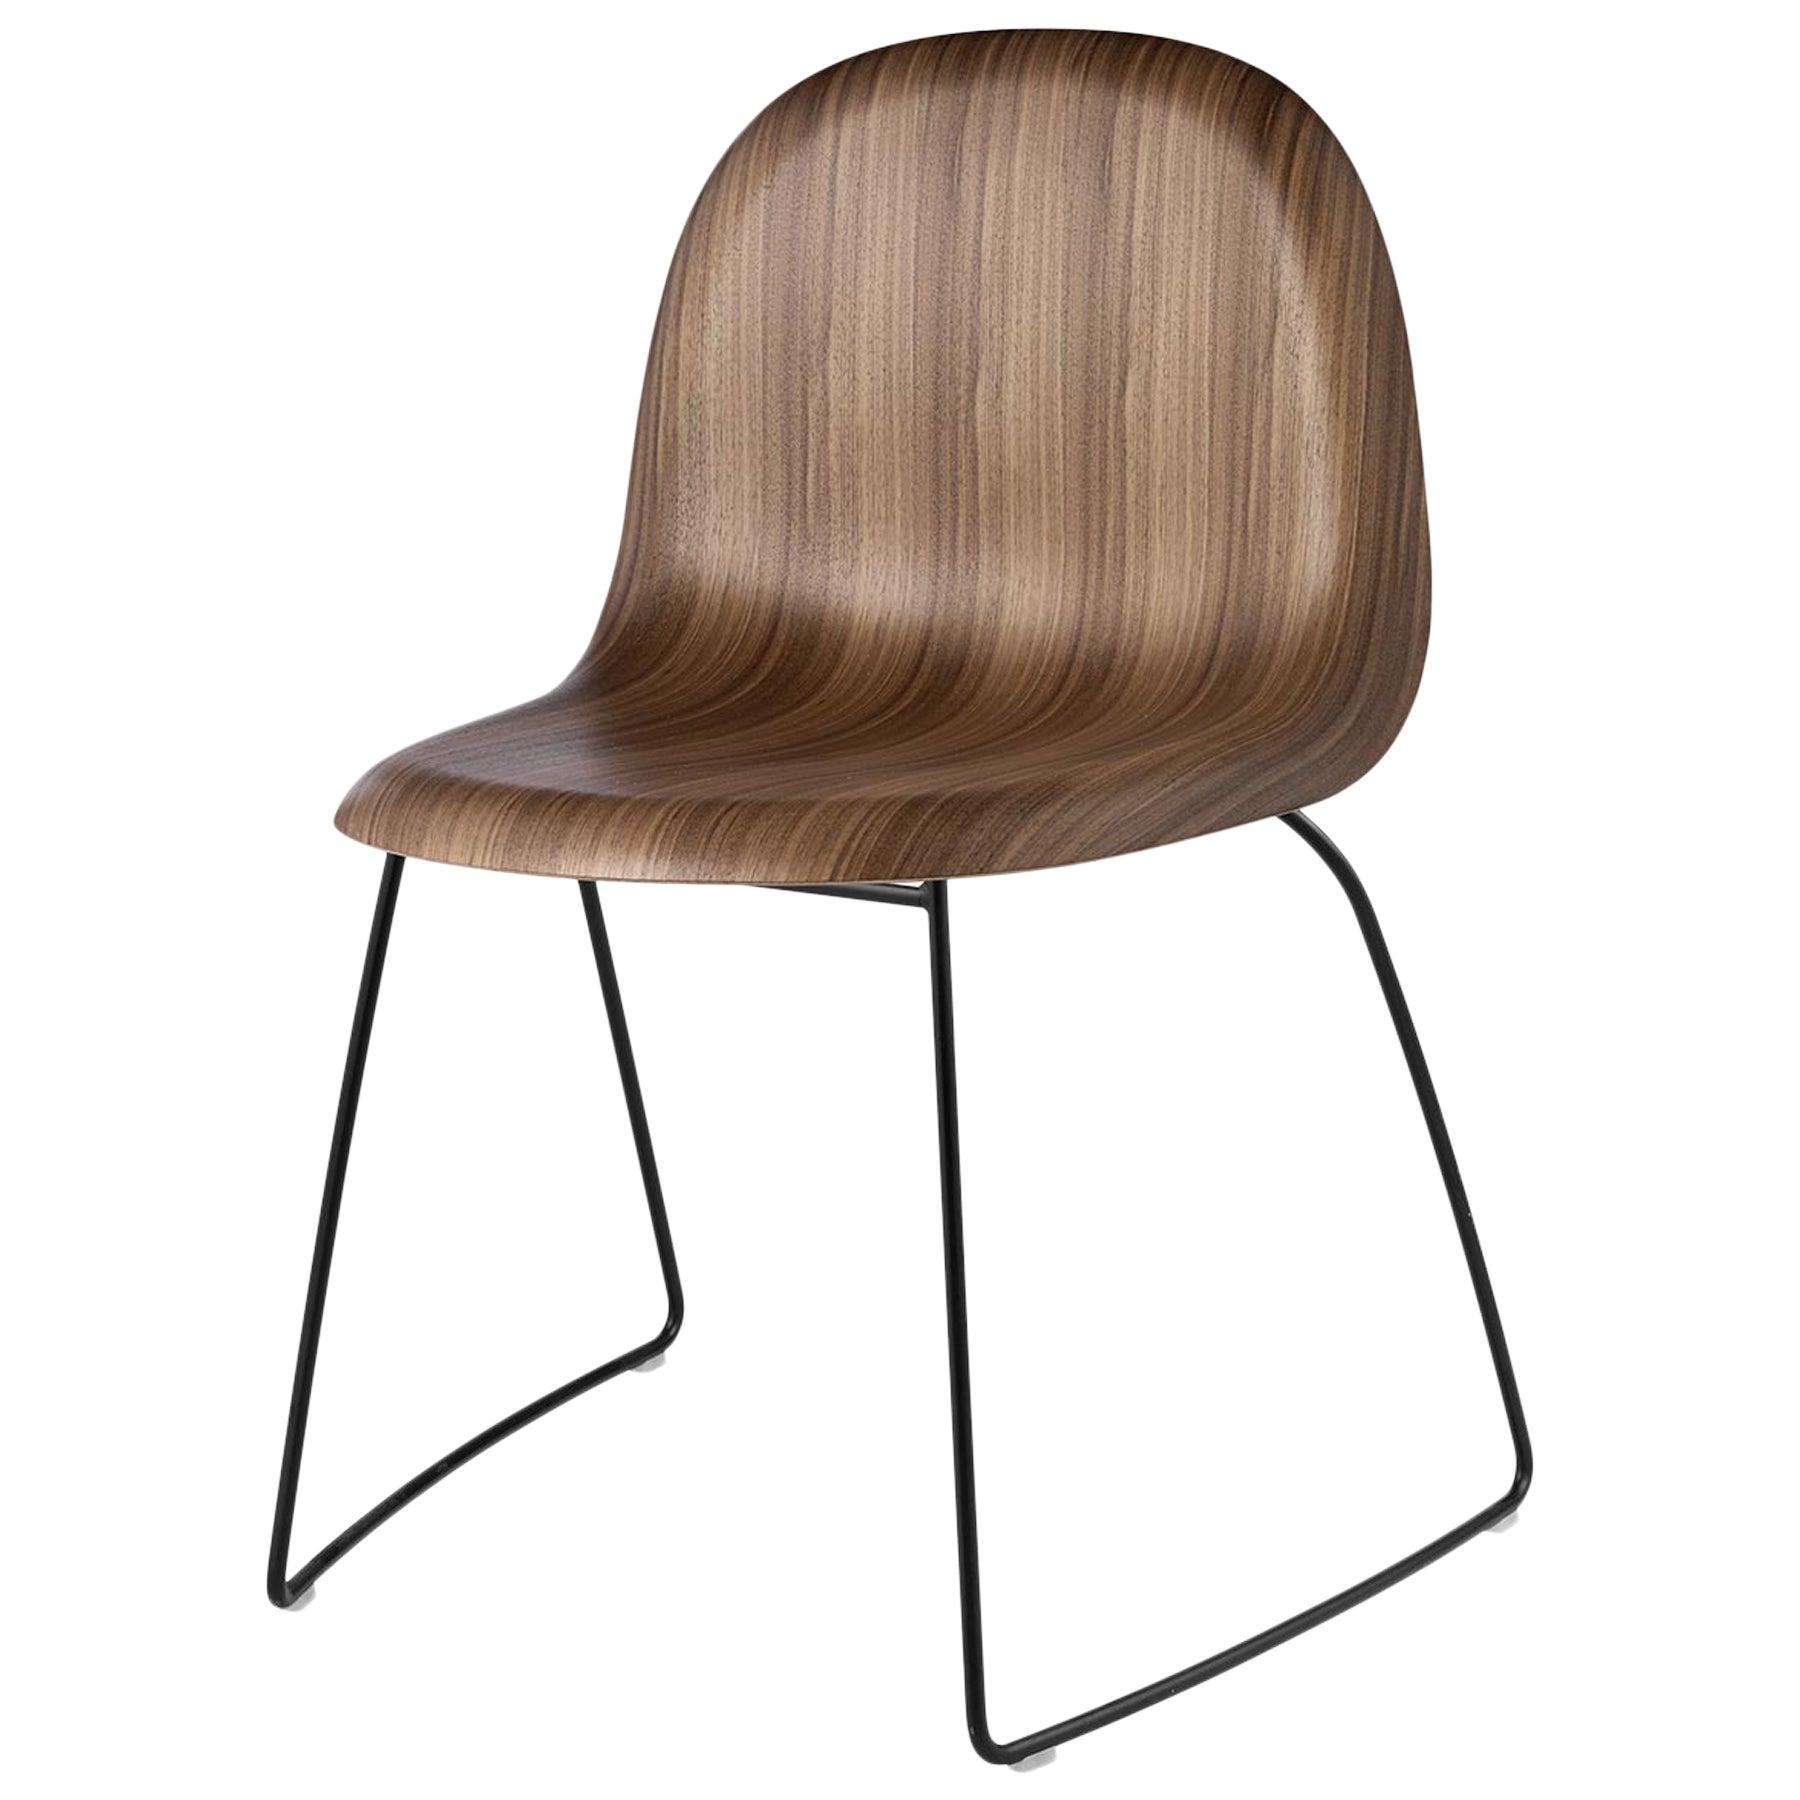 3D Dining Chair, Un-Upholstered, Sledge Base, Hirek Shell